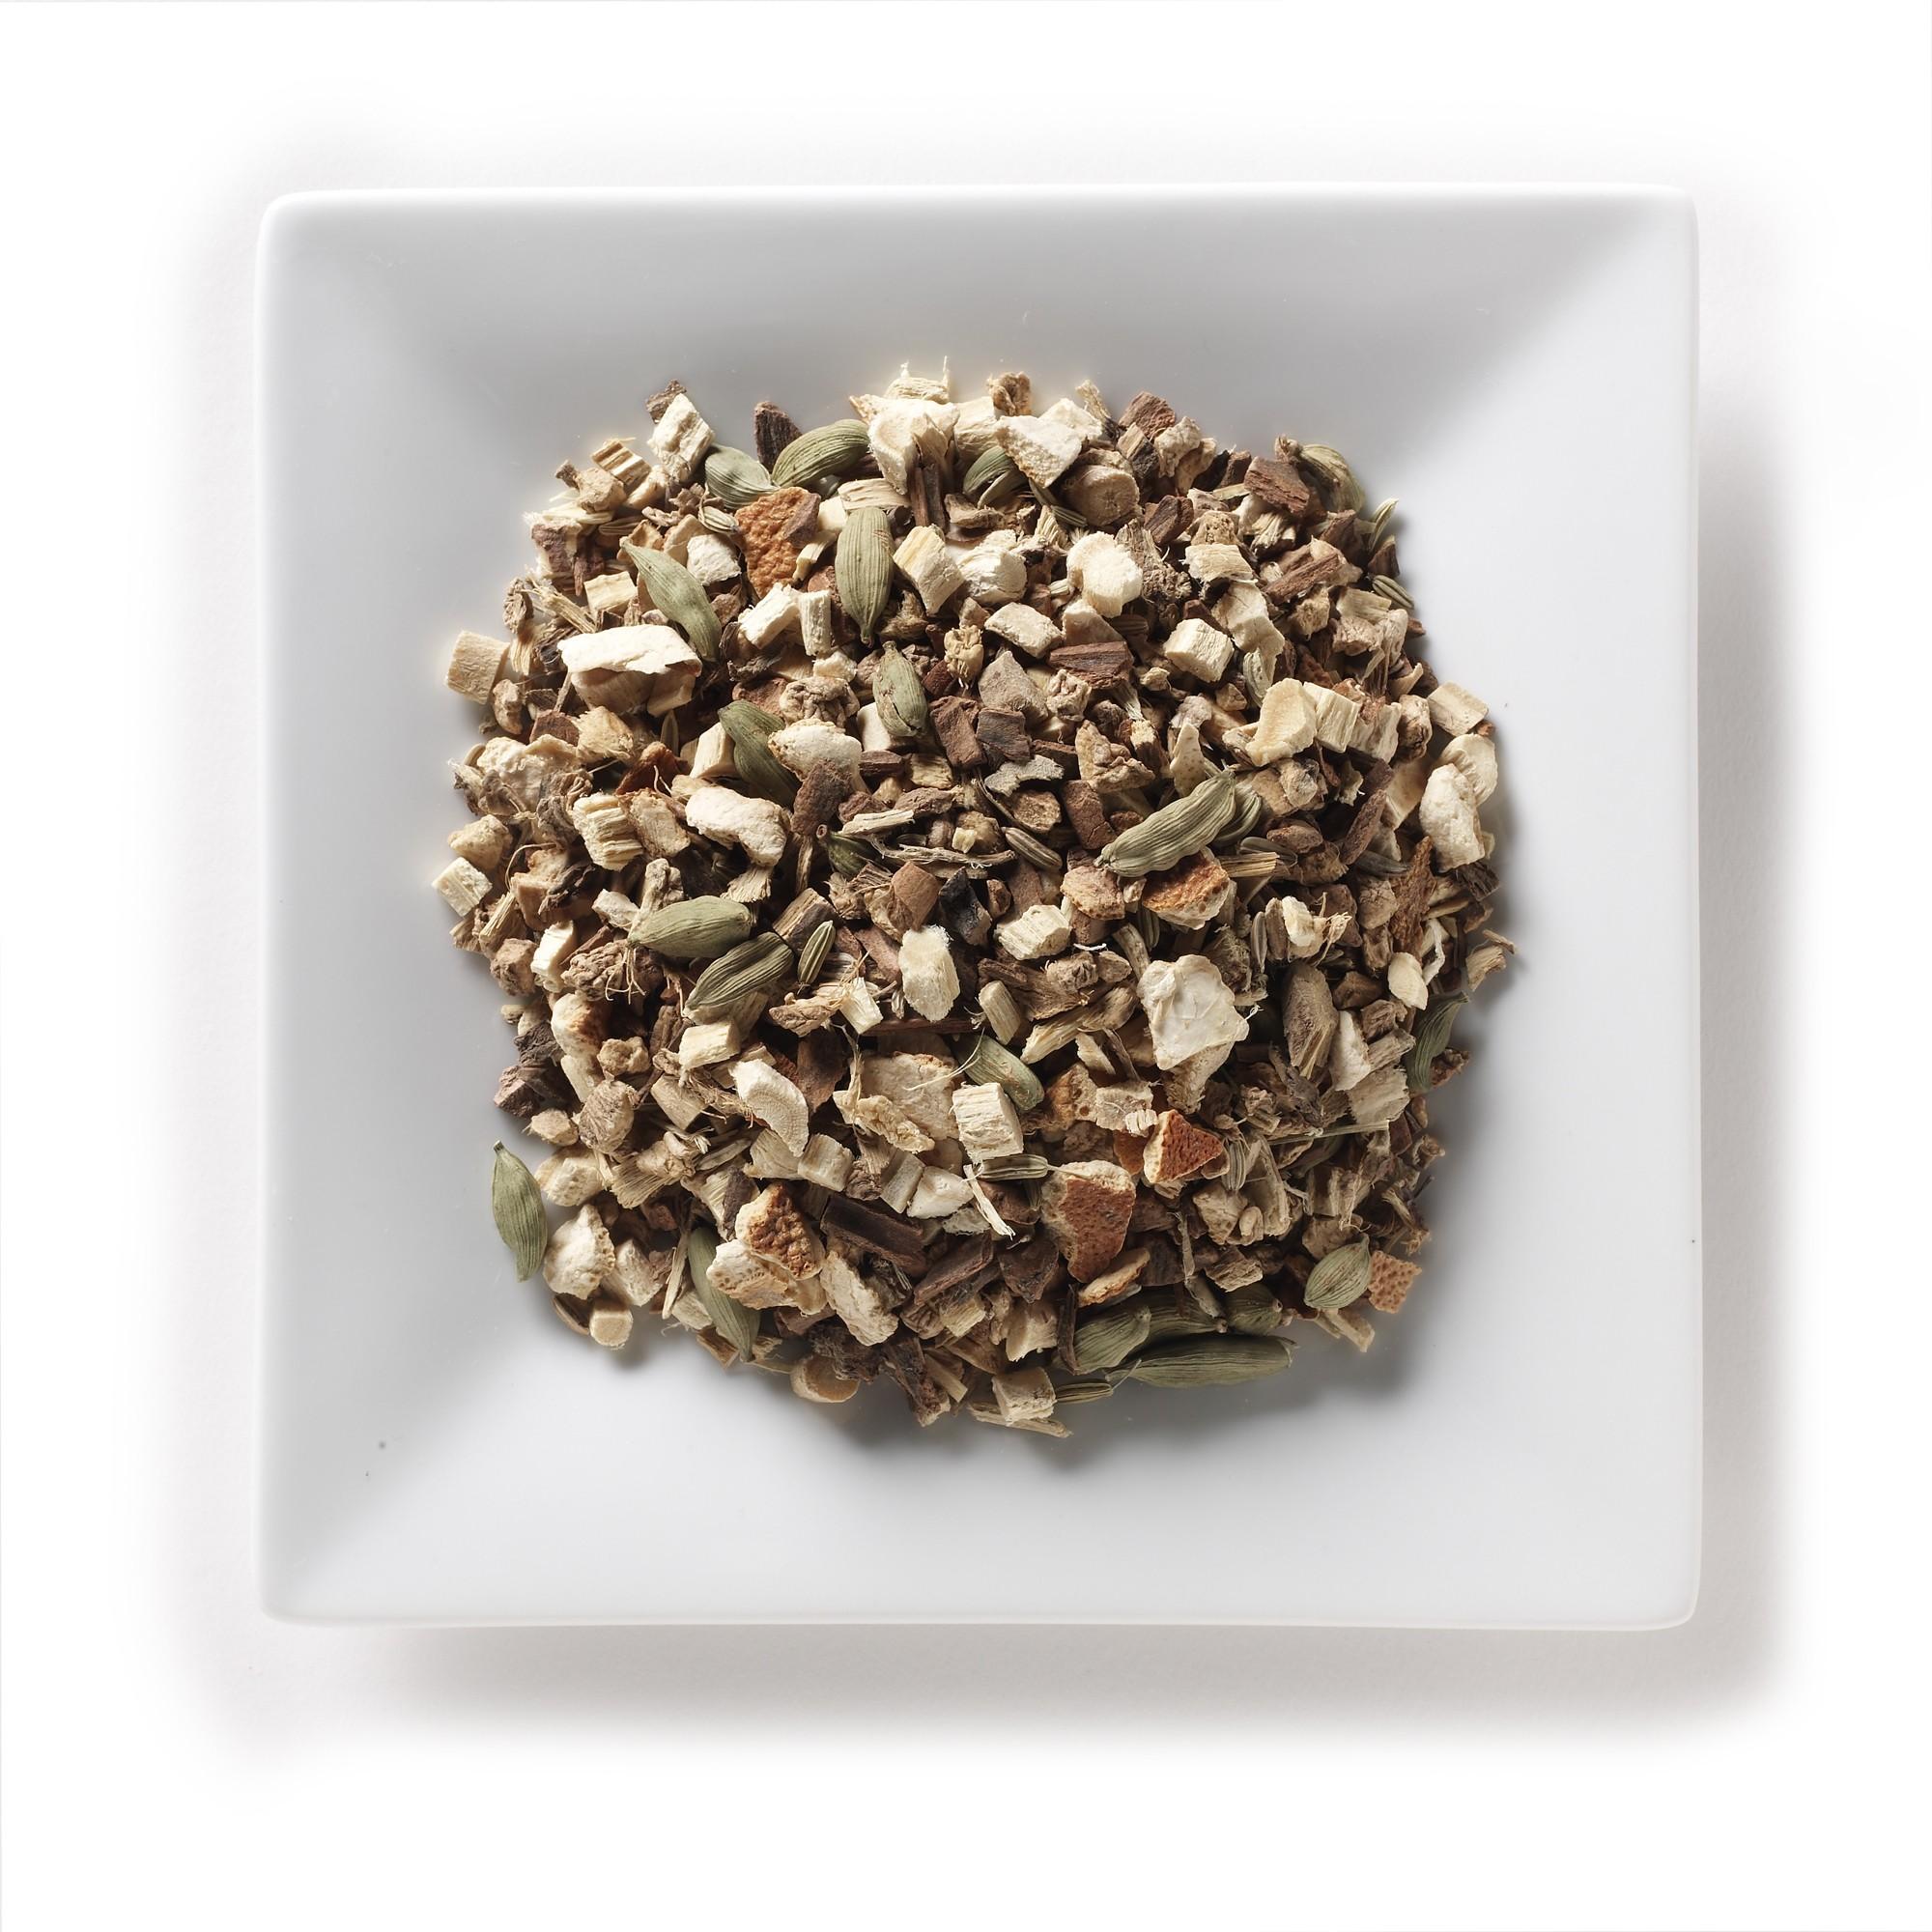 Cinnamon Licorice Spice